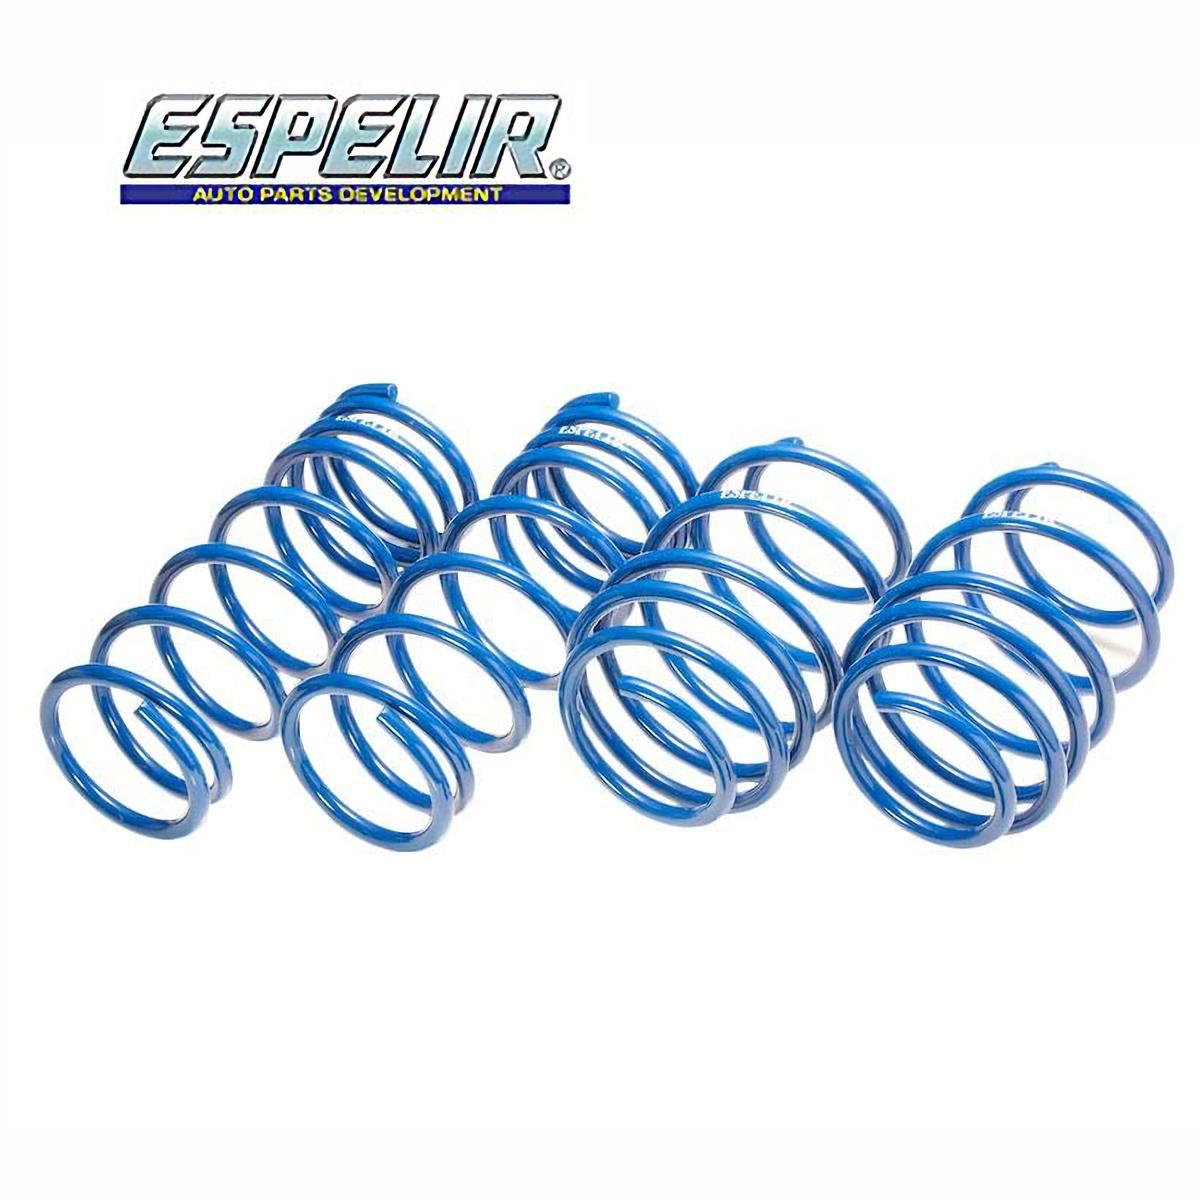 ESPELIR ノア ZRR85G スプリング ダウンサス エスペリア スーパーダウンサス EST-1591R 限定価格セール Super リア DOWNSUS 10%OFF